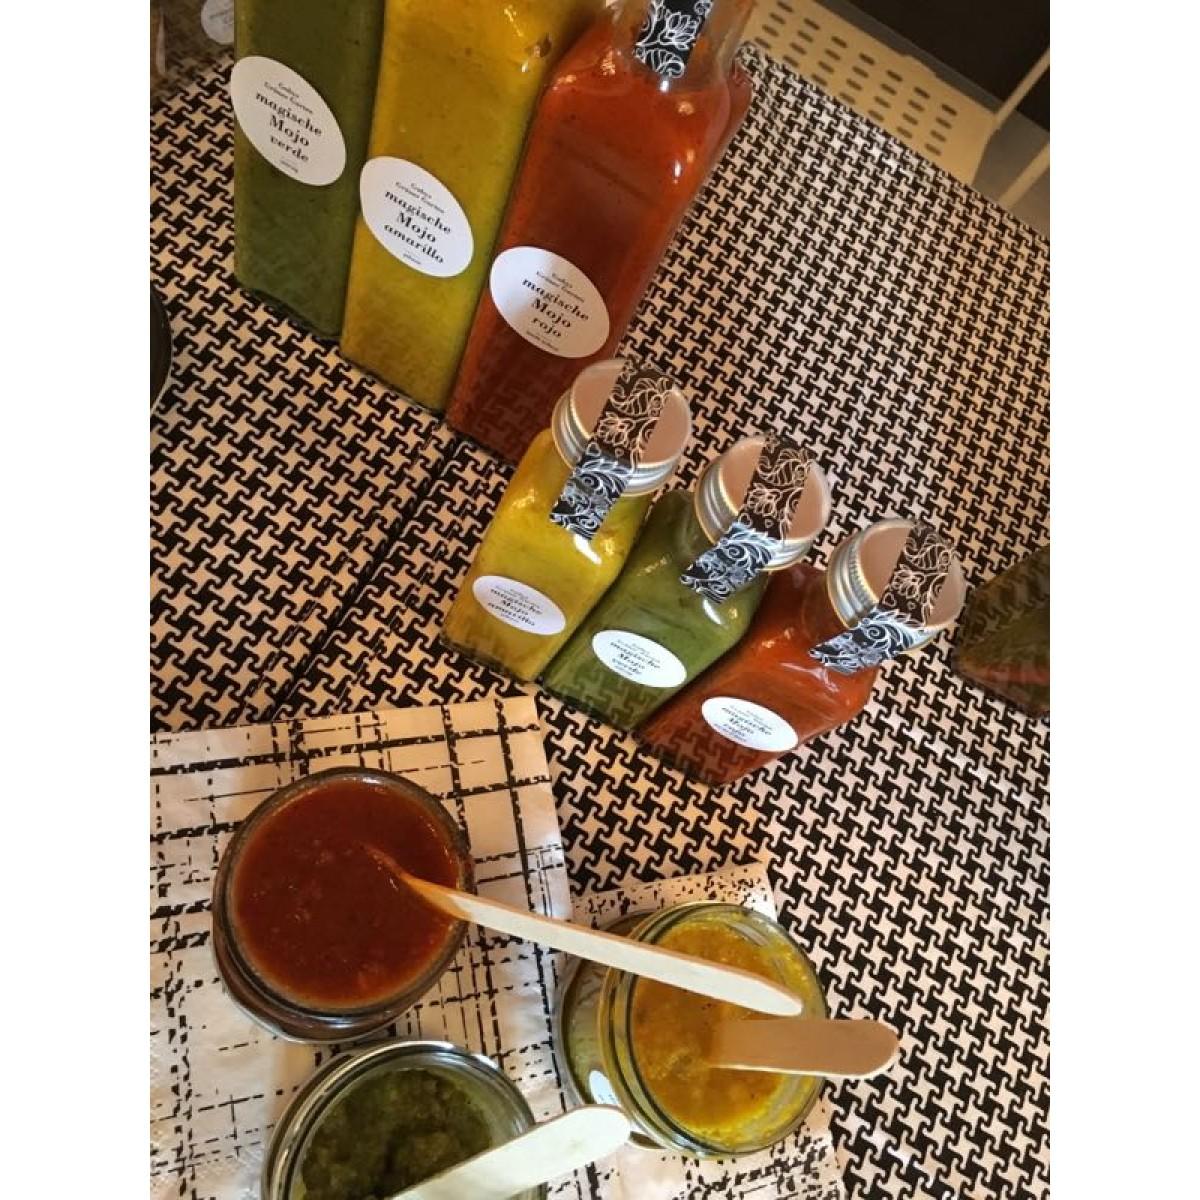 Gabys grüner Garten magische Mojo Amarillo (Salsa) 250ml